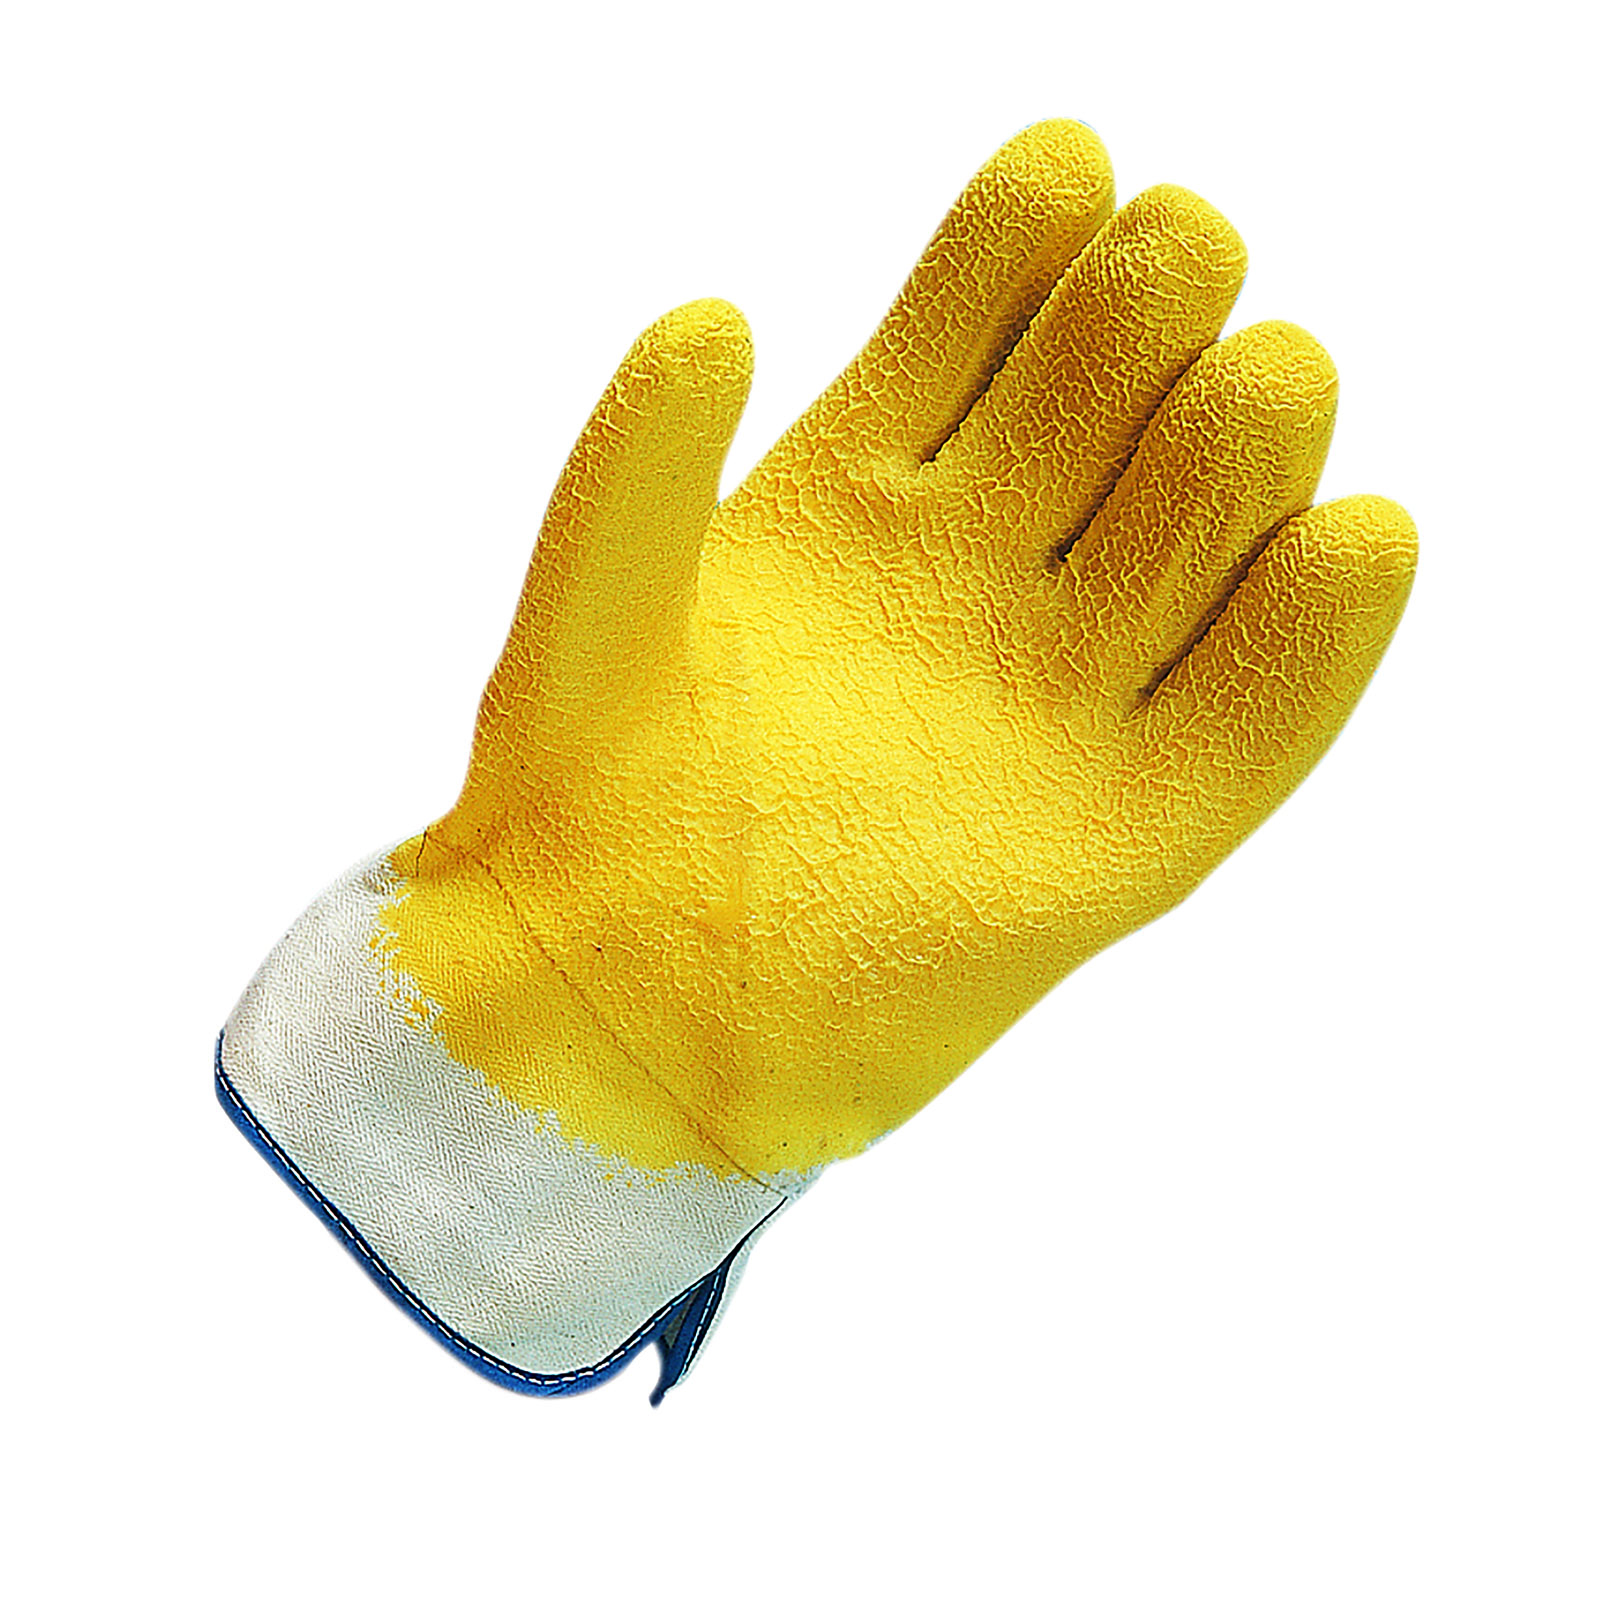 San Jamar 1000 glove, cut resistant